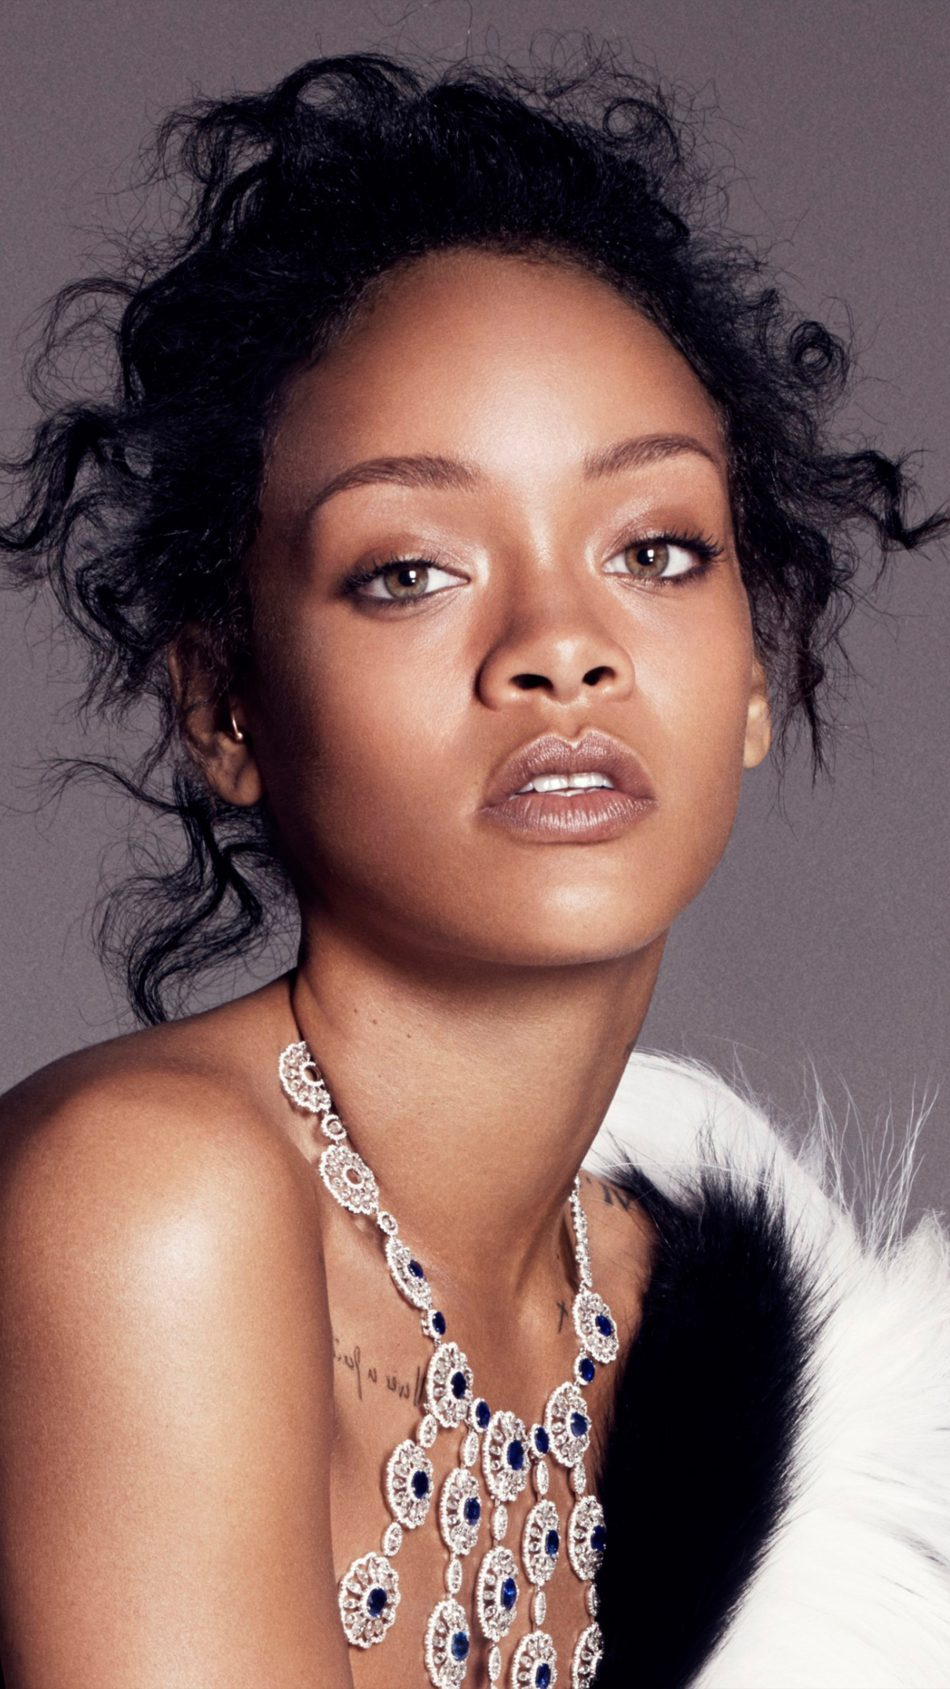 Singer Rihanna 2018 Photoshoot 4K Ultra HD Mobile Wallpaper